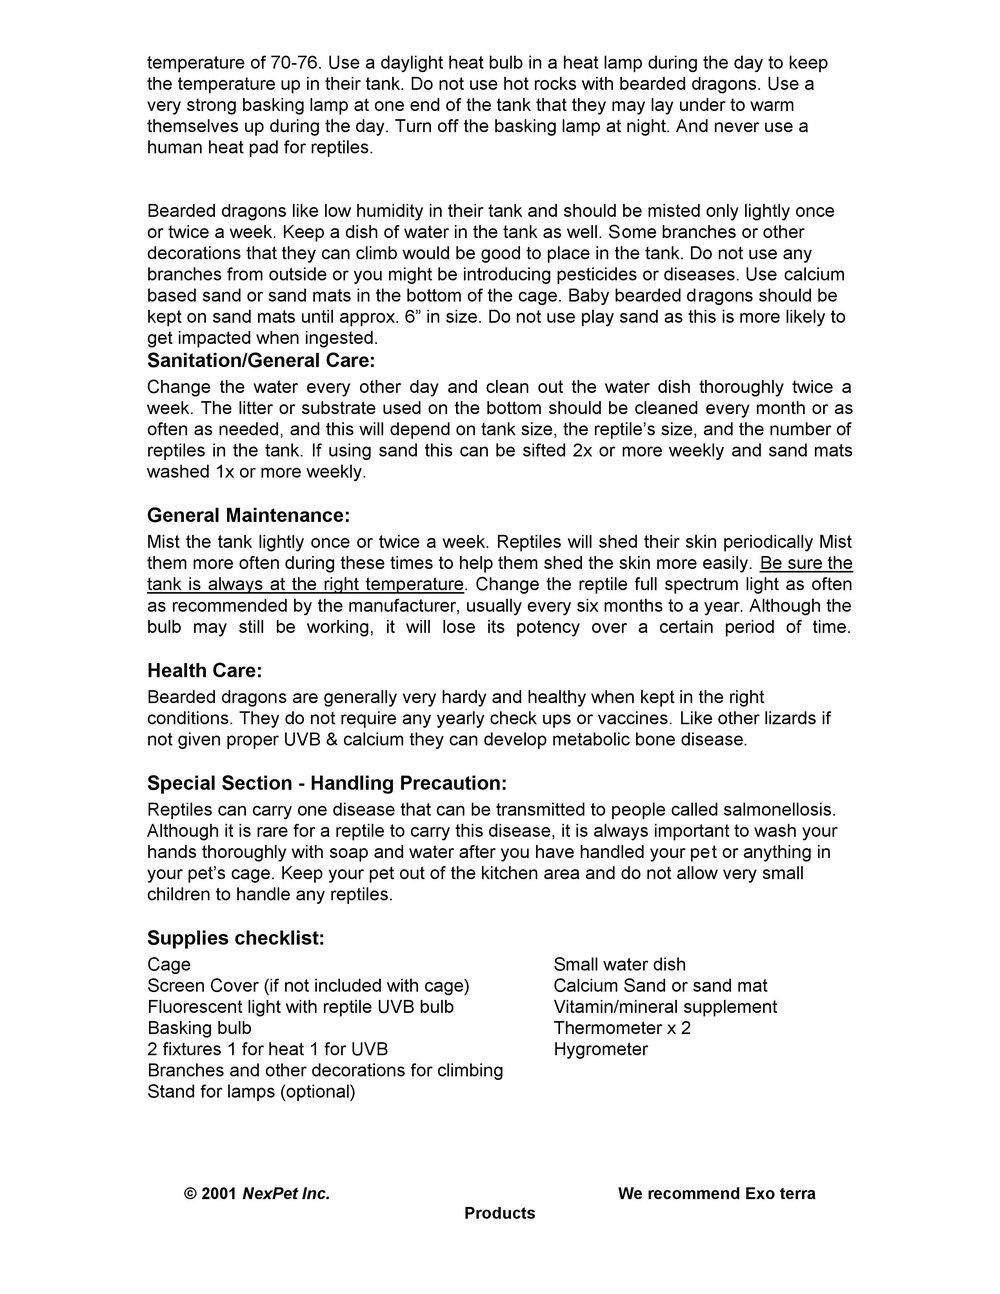 Bearded Dragon Care Sheet pg2